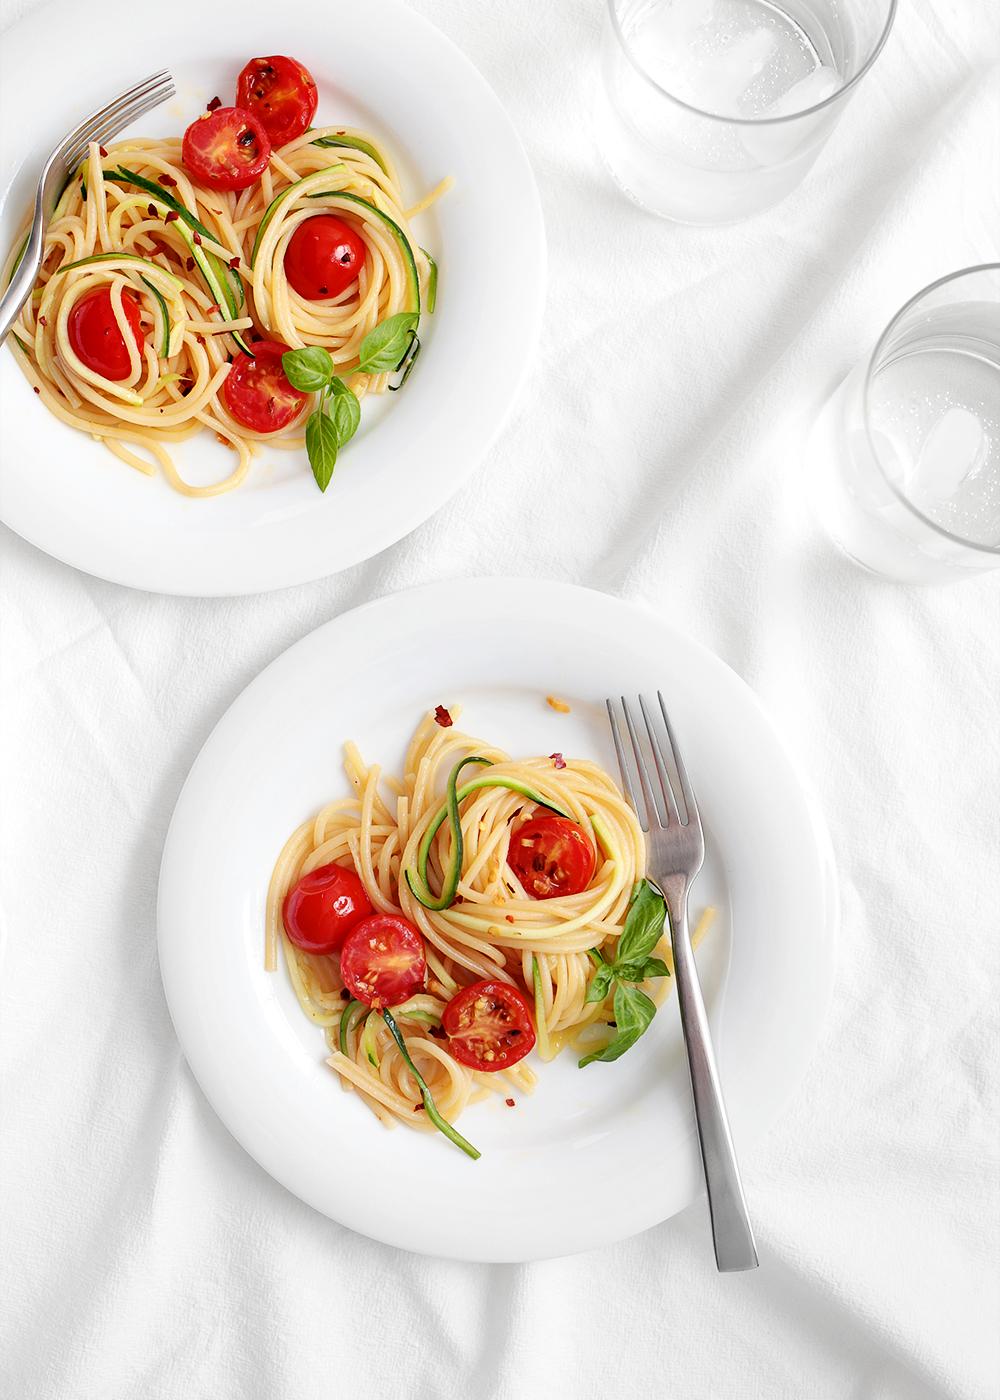 Spicy Zucchini Spaghetti recipe